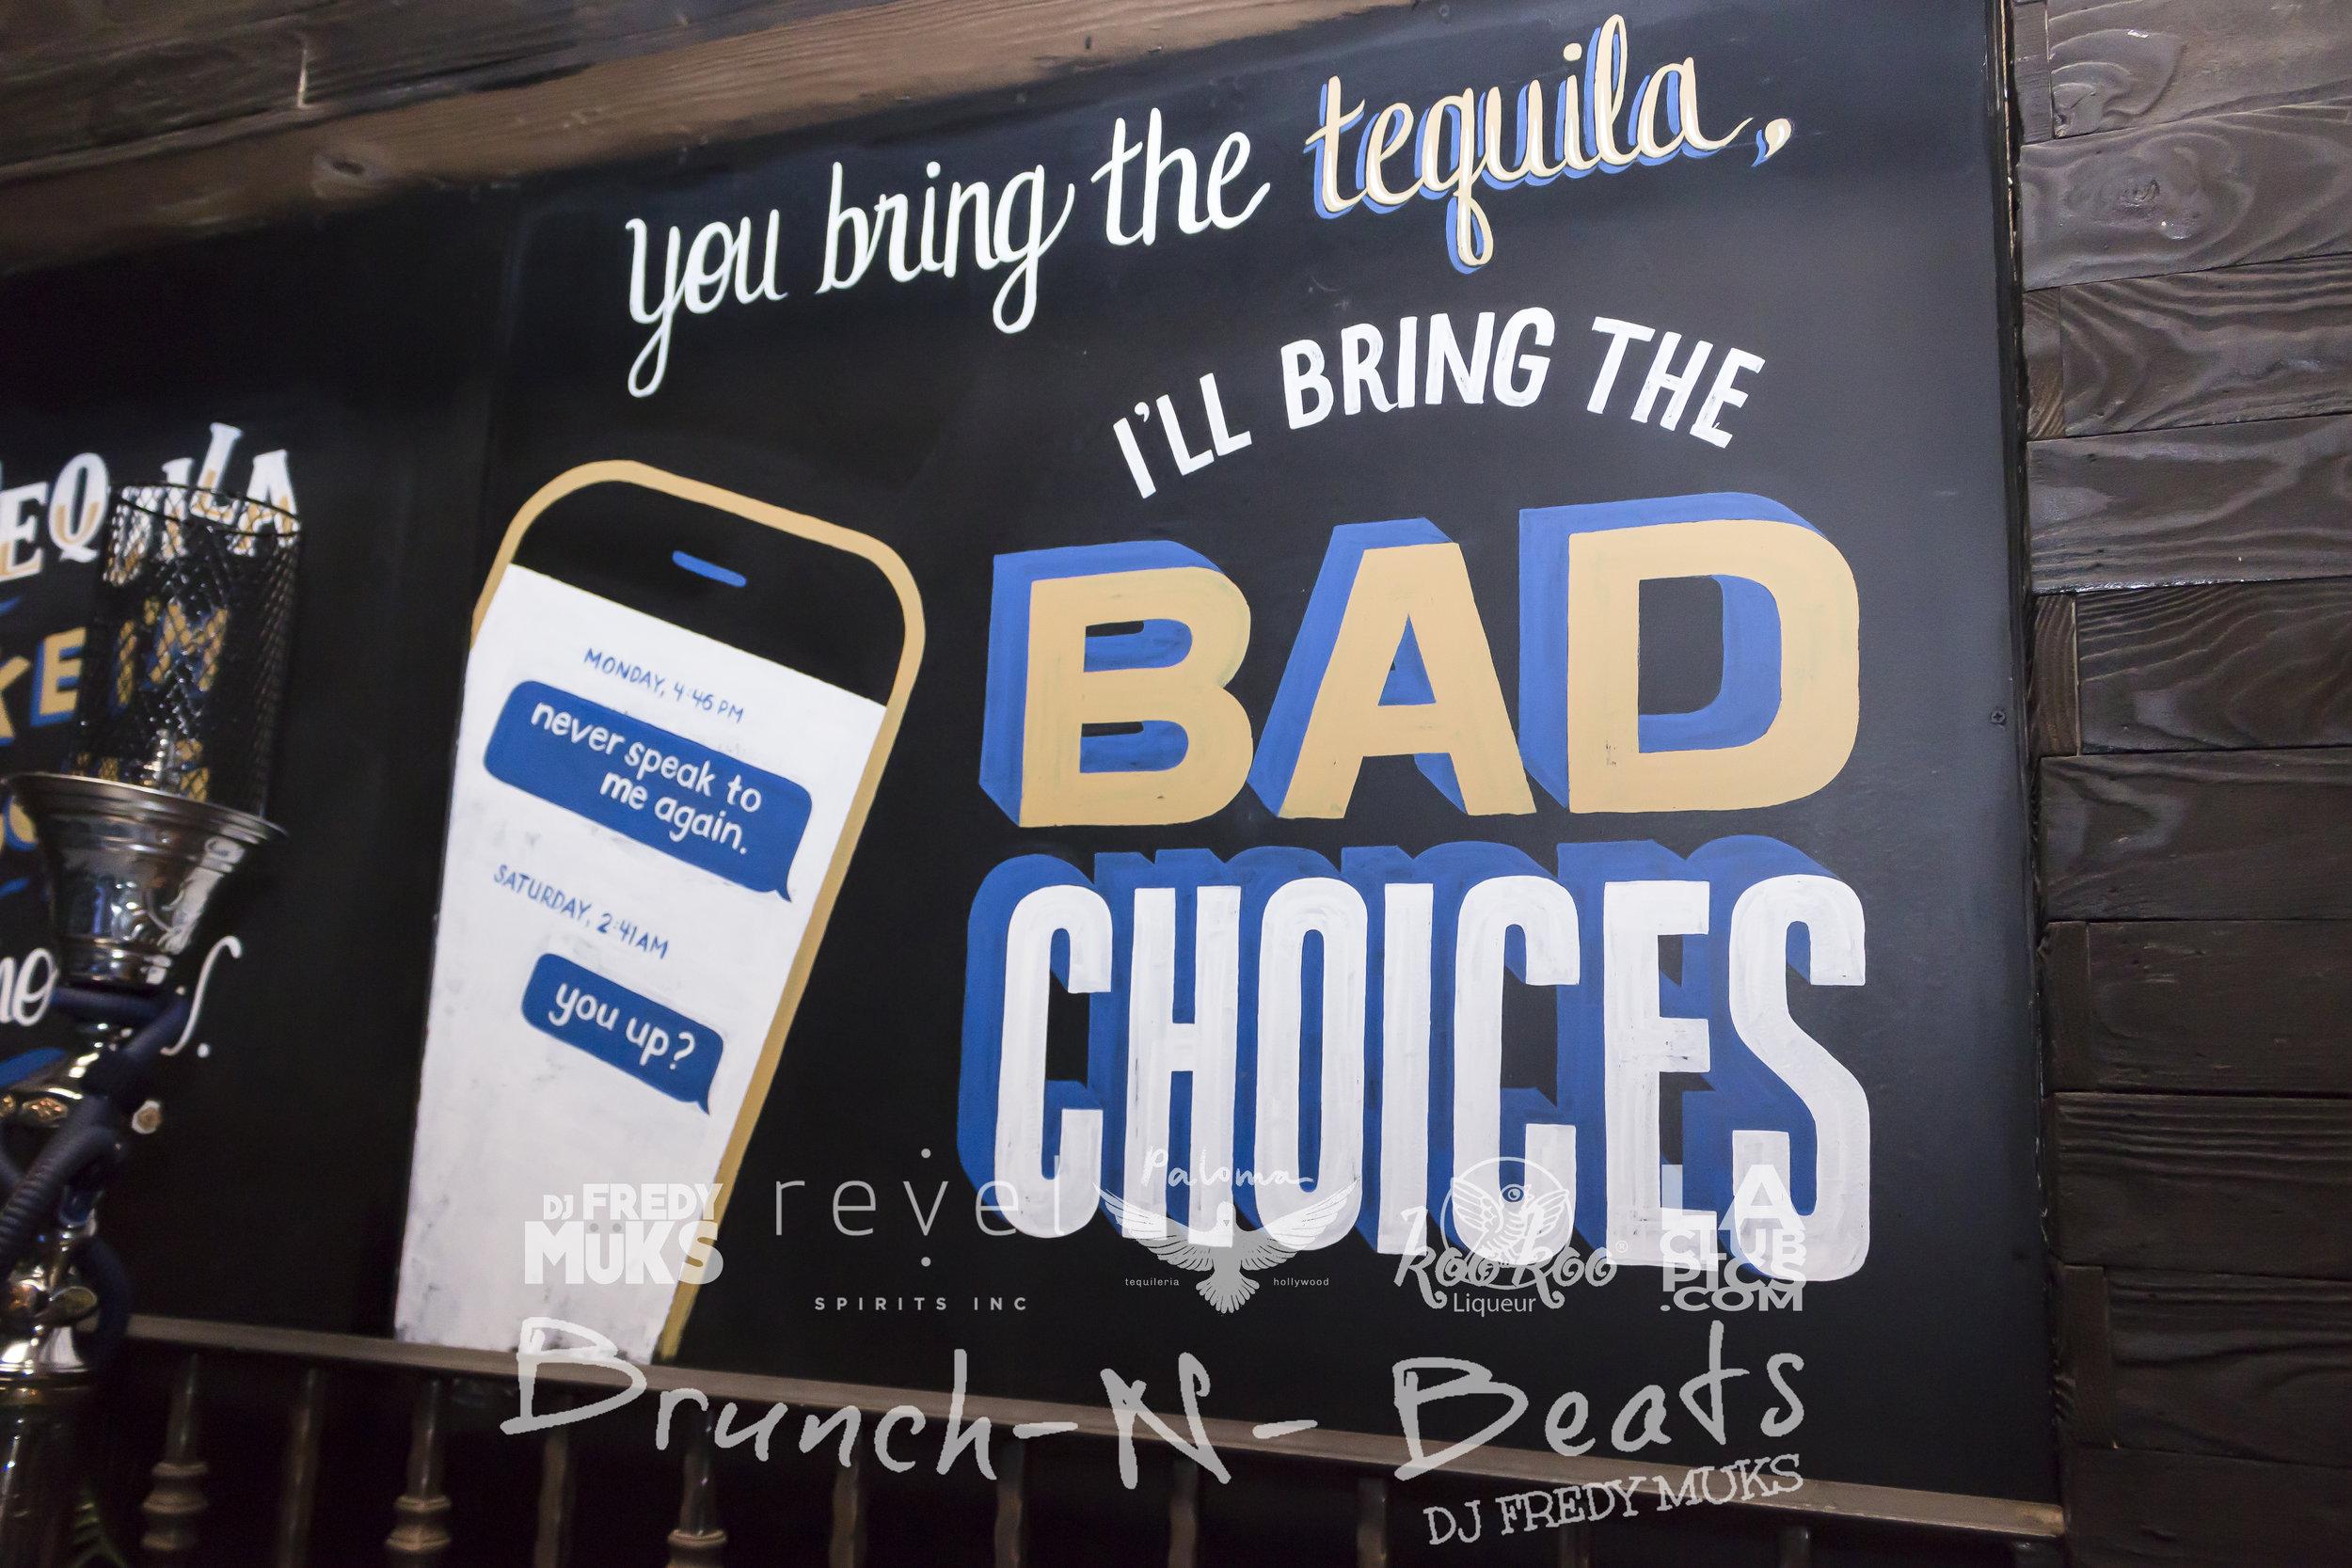 Brunch-N-Beats - Paloma Hollywood - 02-25-18_29.jpg